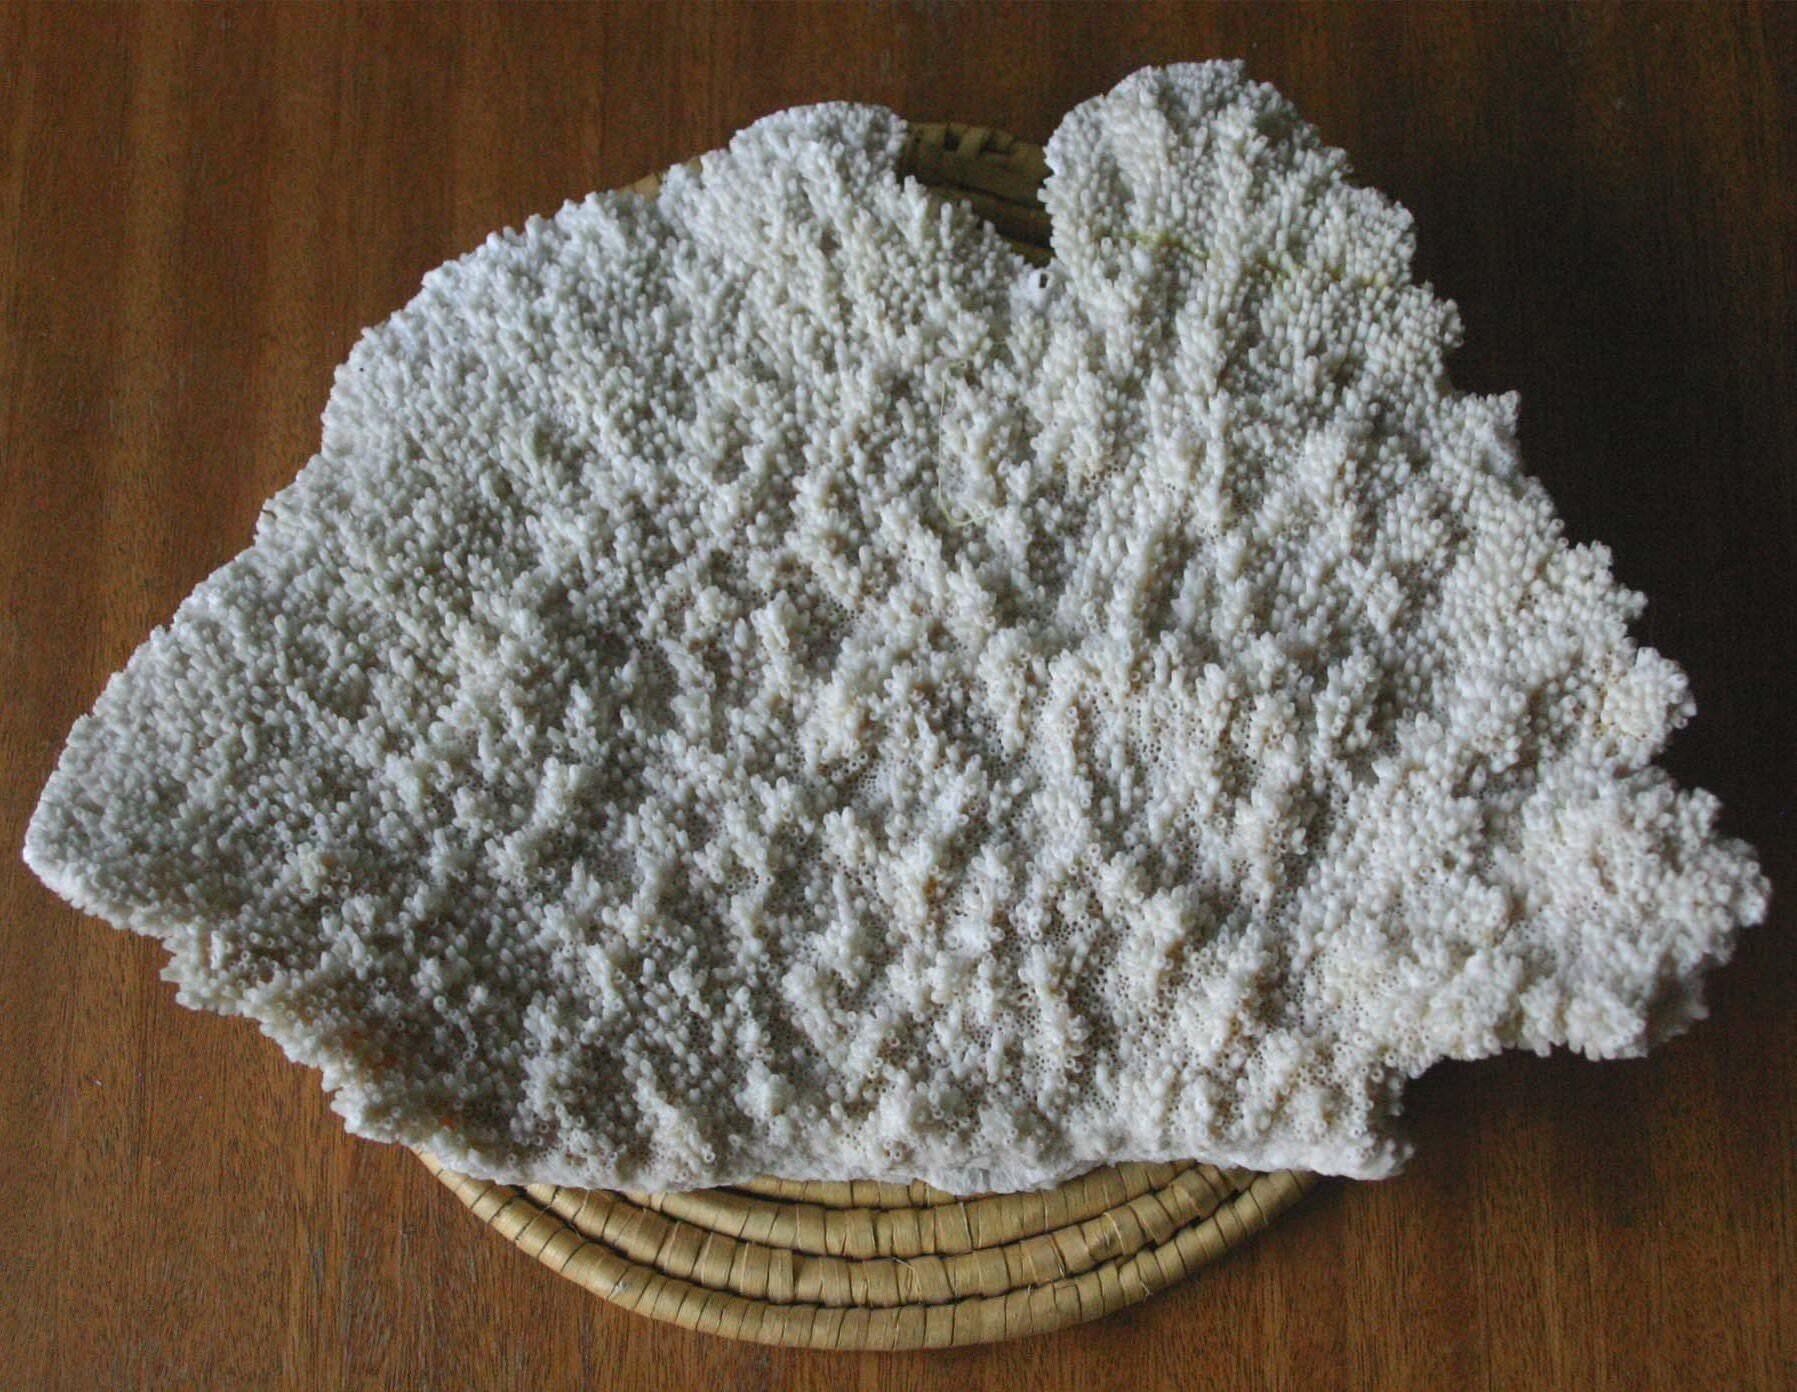 074. Коралл 4, тип Acropora palmata, фото 3